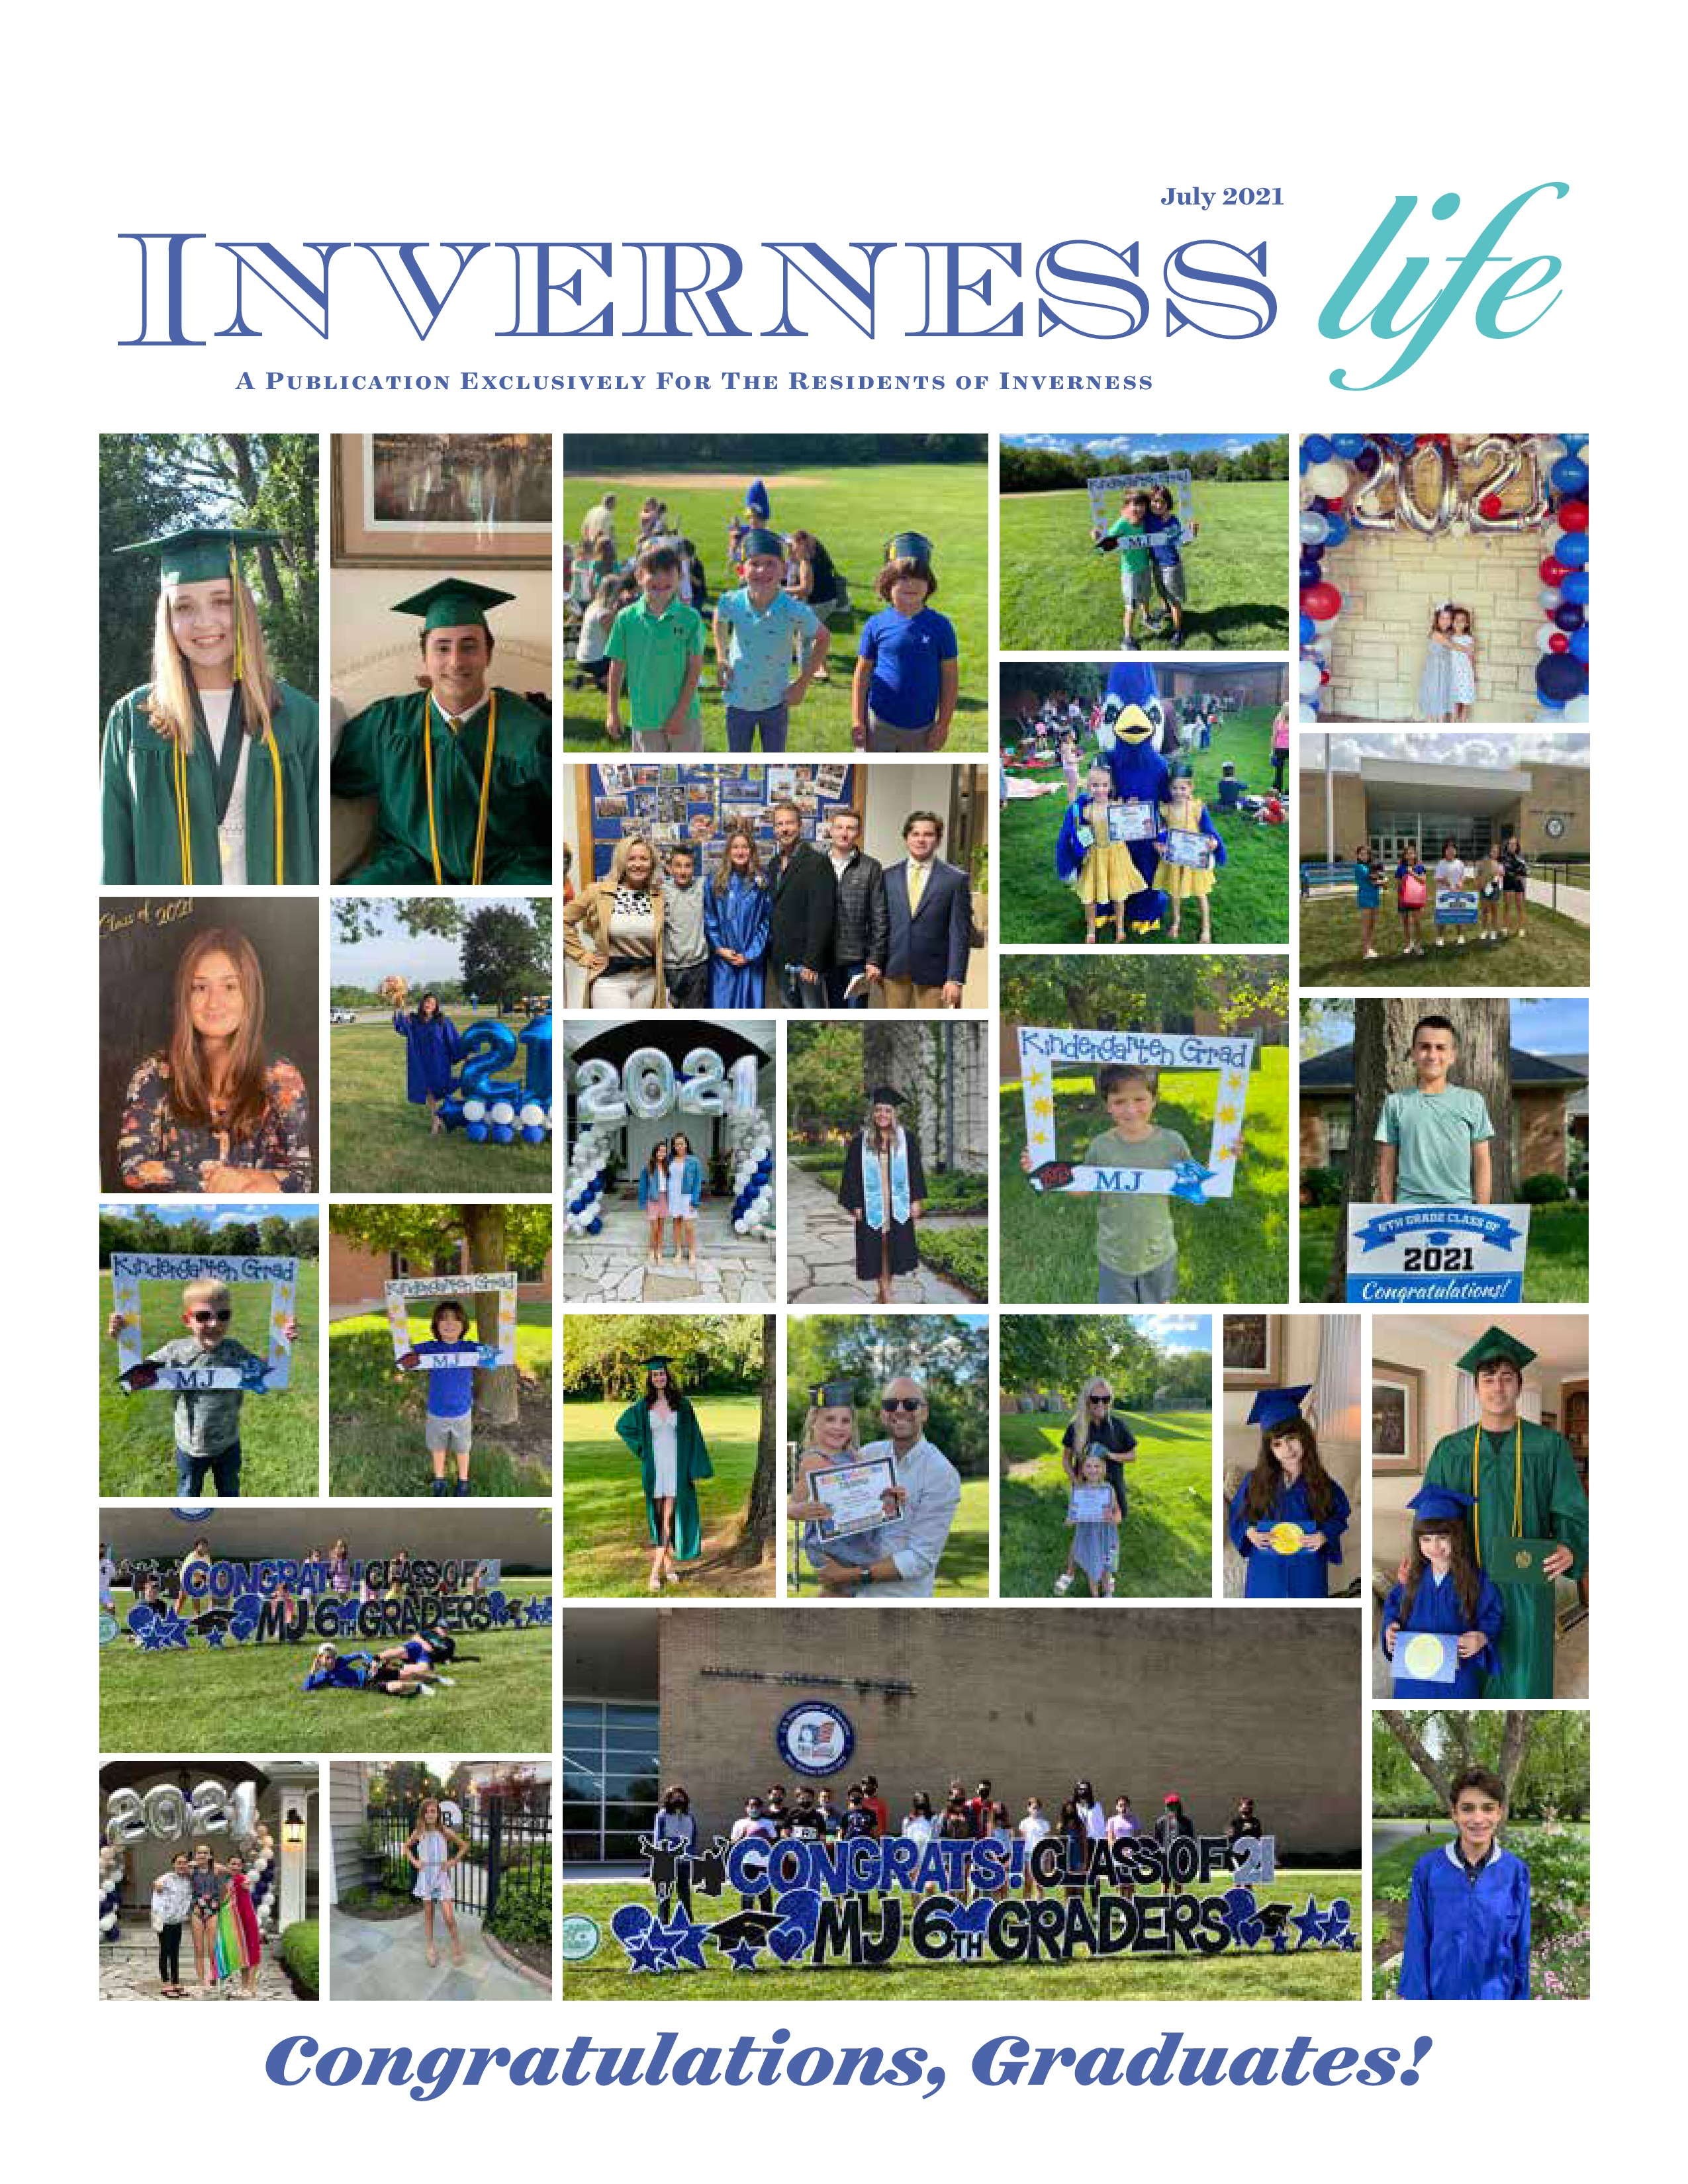 Inverness Life 2021-07-01